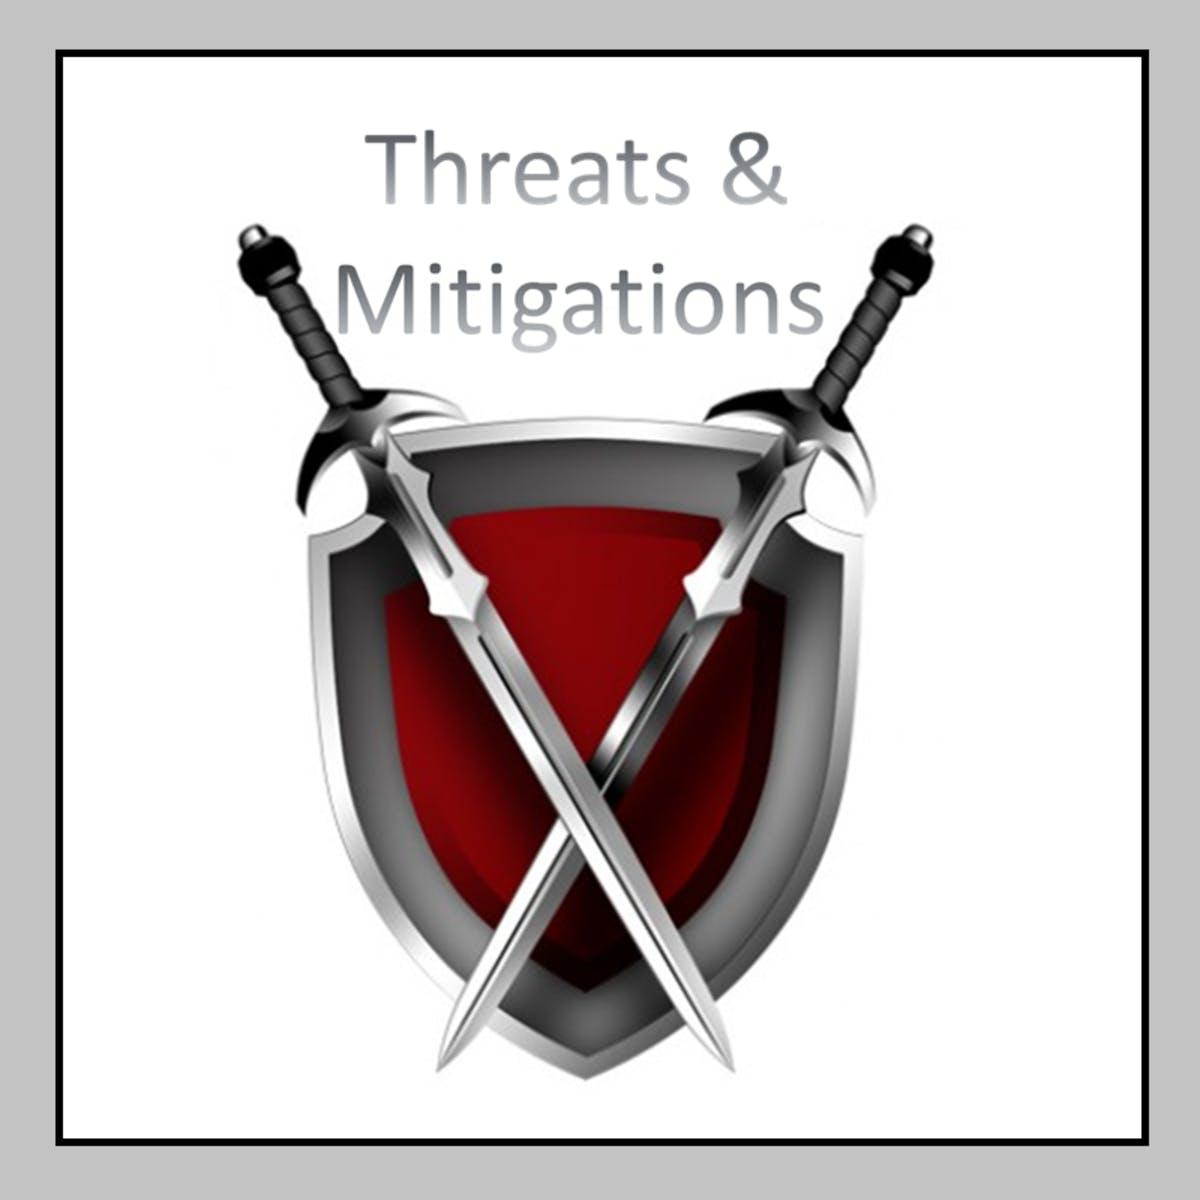 Software Design Threats and Mitigations